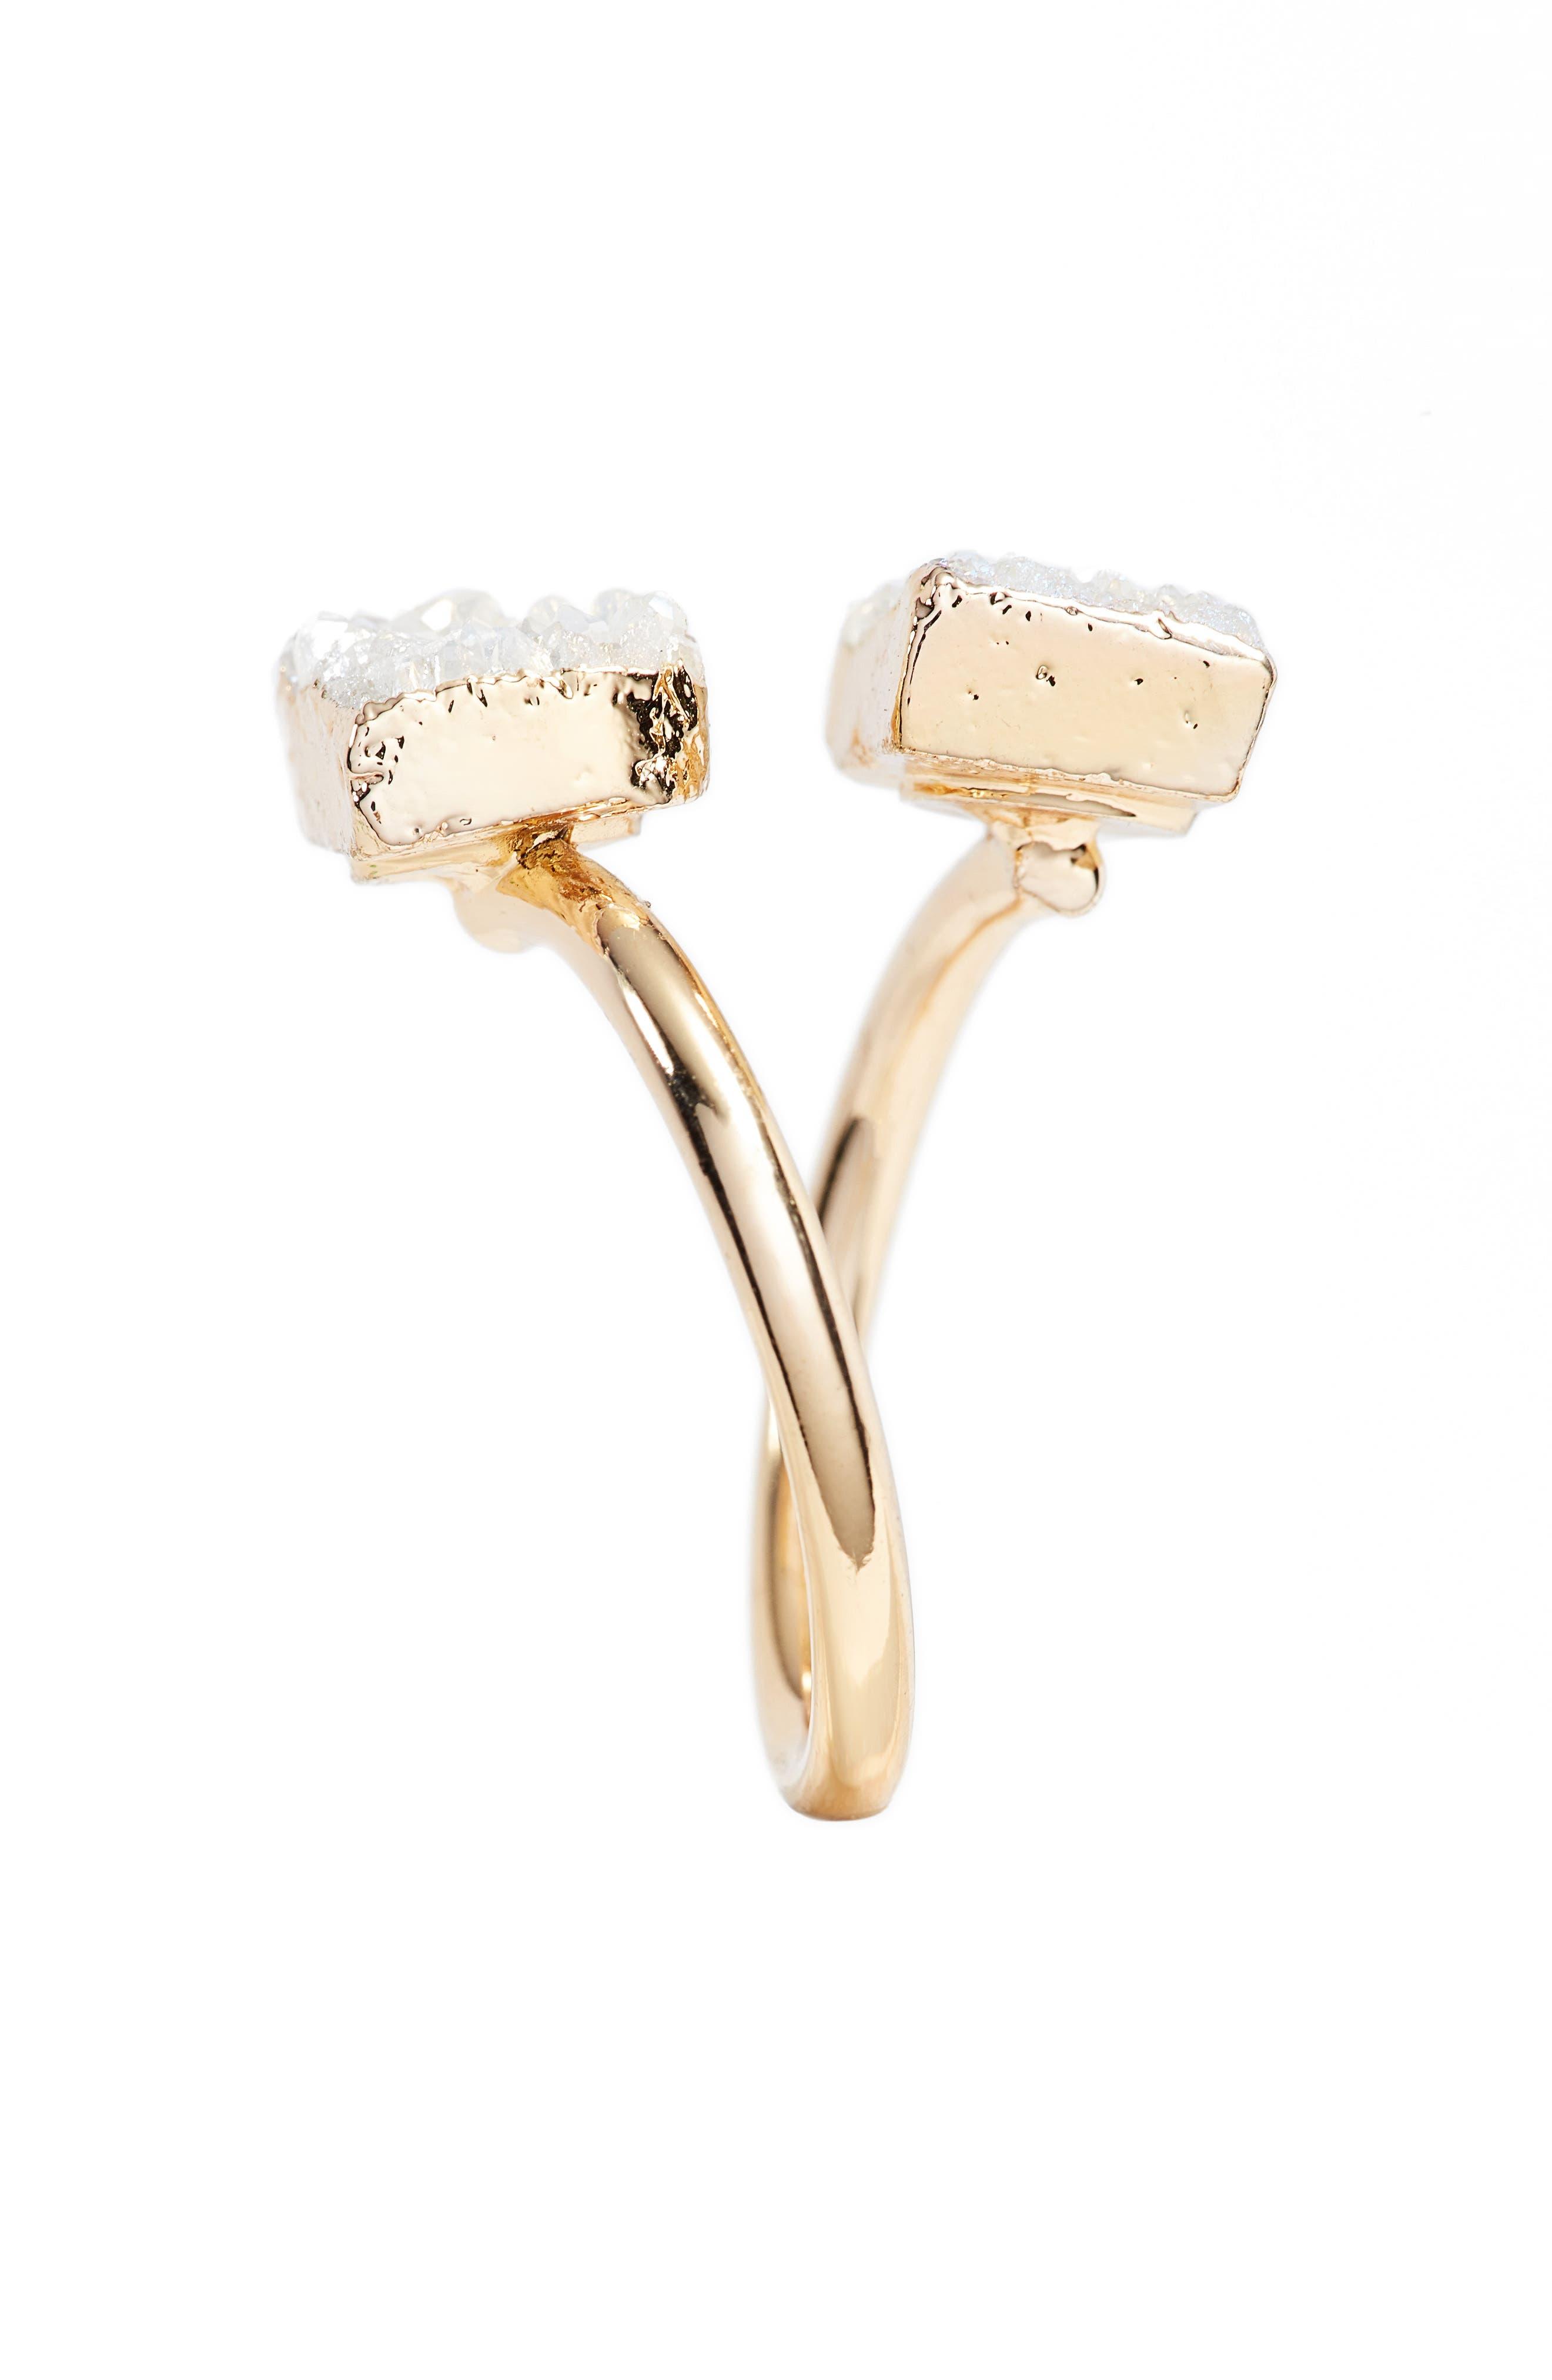 Jessa Drusy Quartz Adjustable Ring,                             Alternate thumbnail 2, color,                             Natural